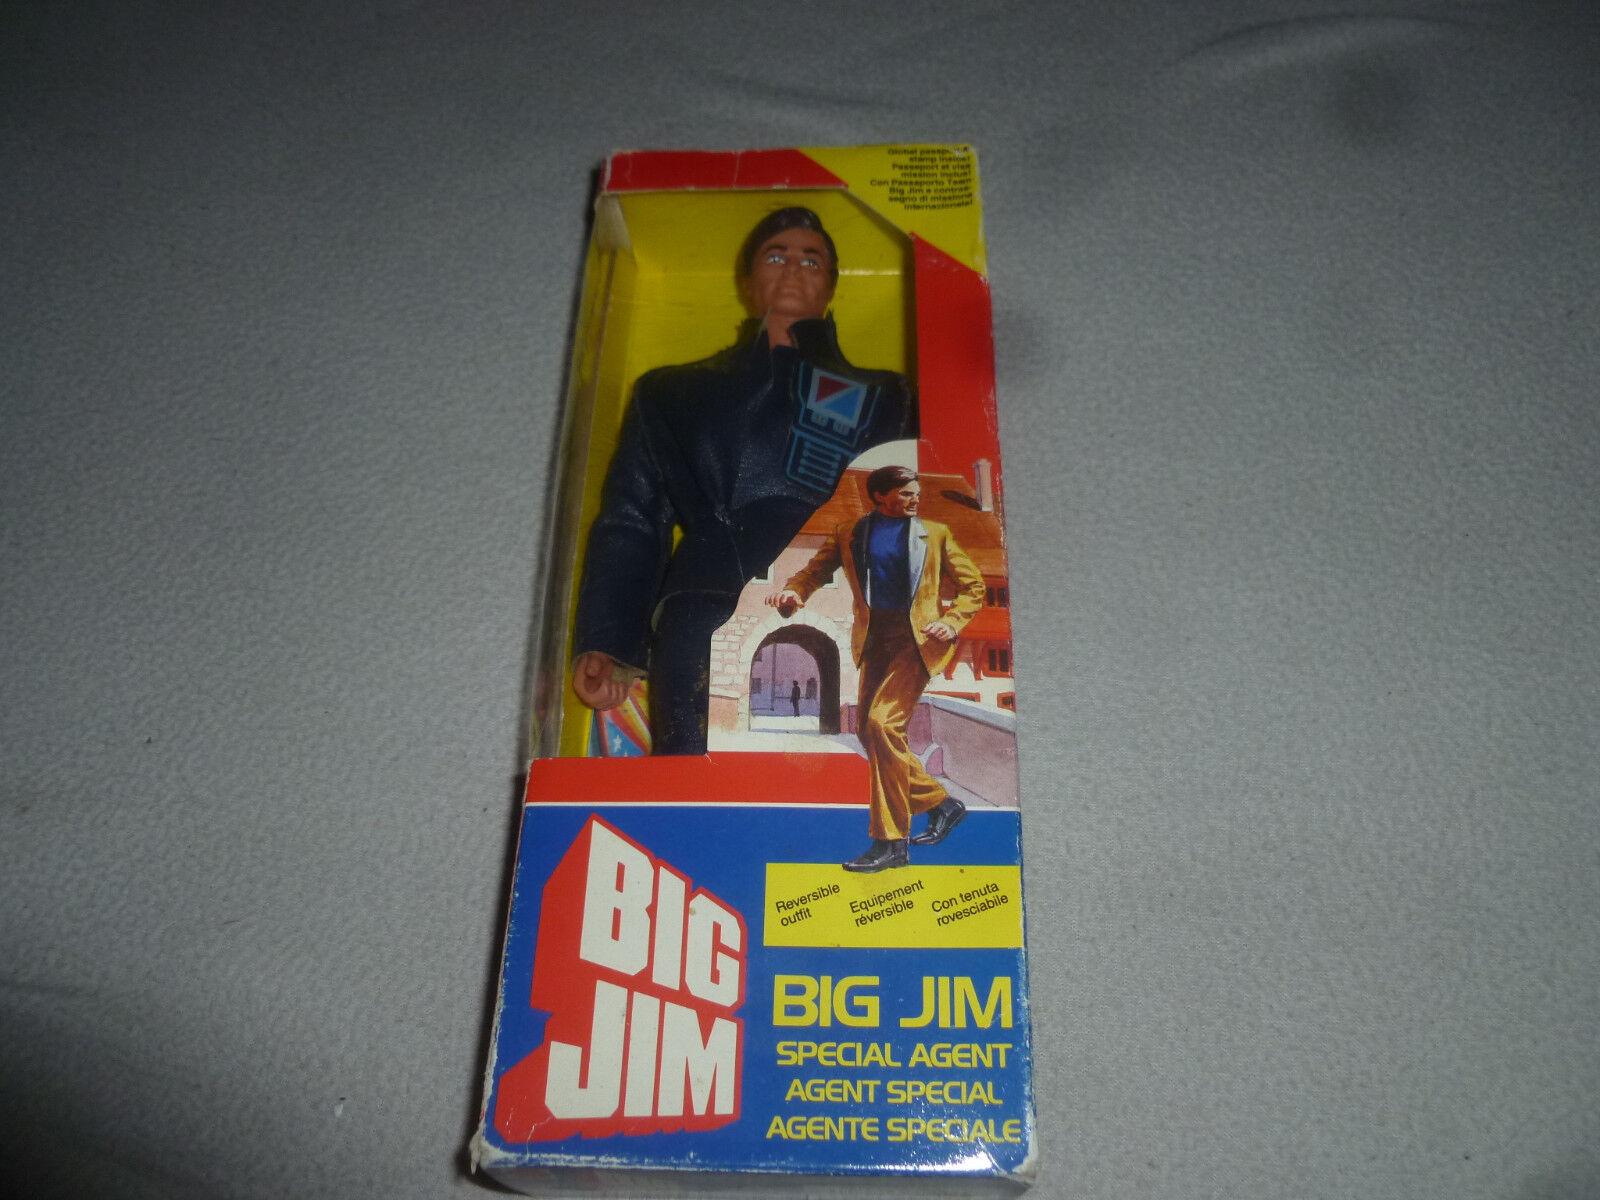 NEW IN BOX BIG JIM SPECIAL AGENT MATTEL VINTAGE ACTION FIGURE 9289 NIB 1984 RARE